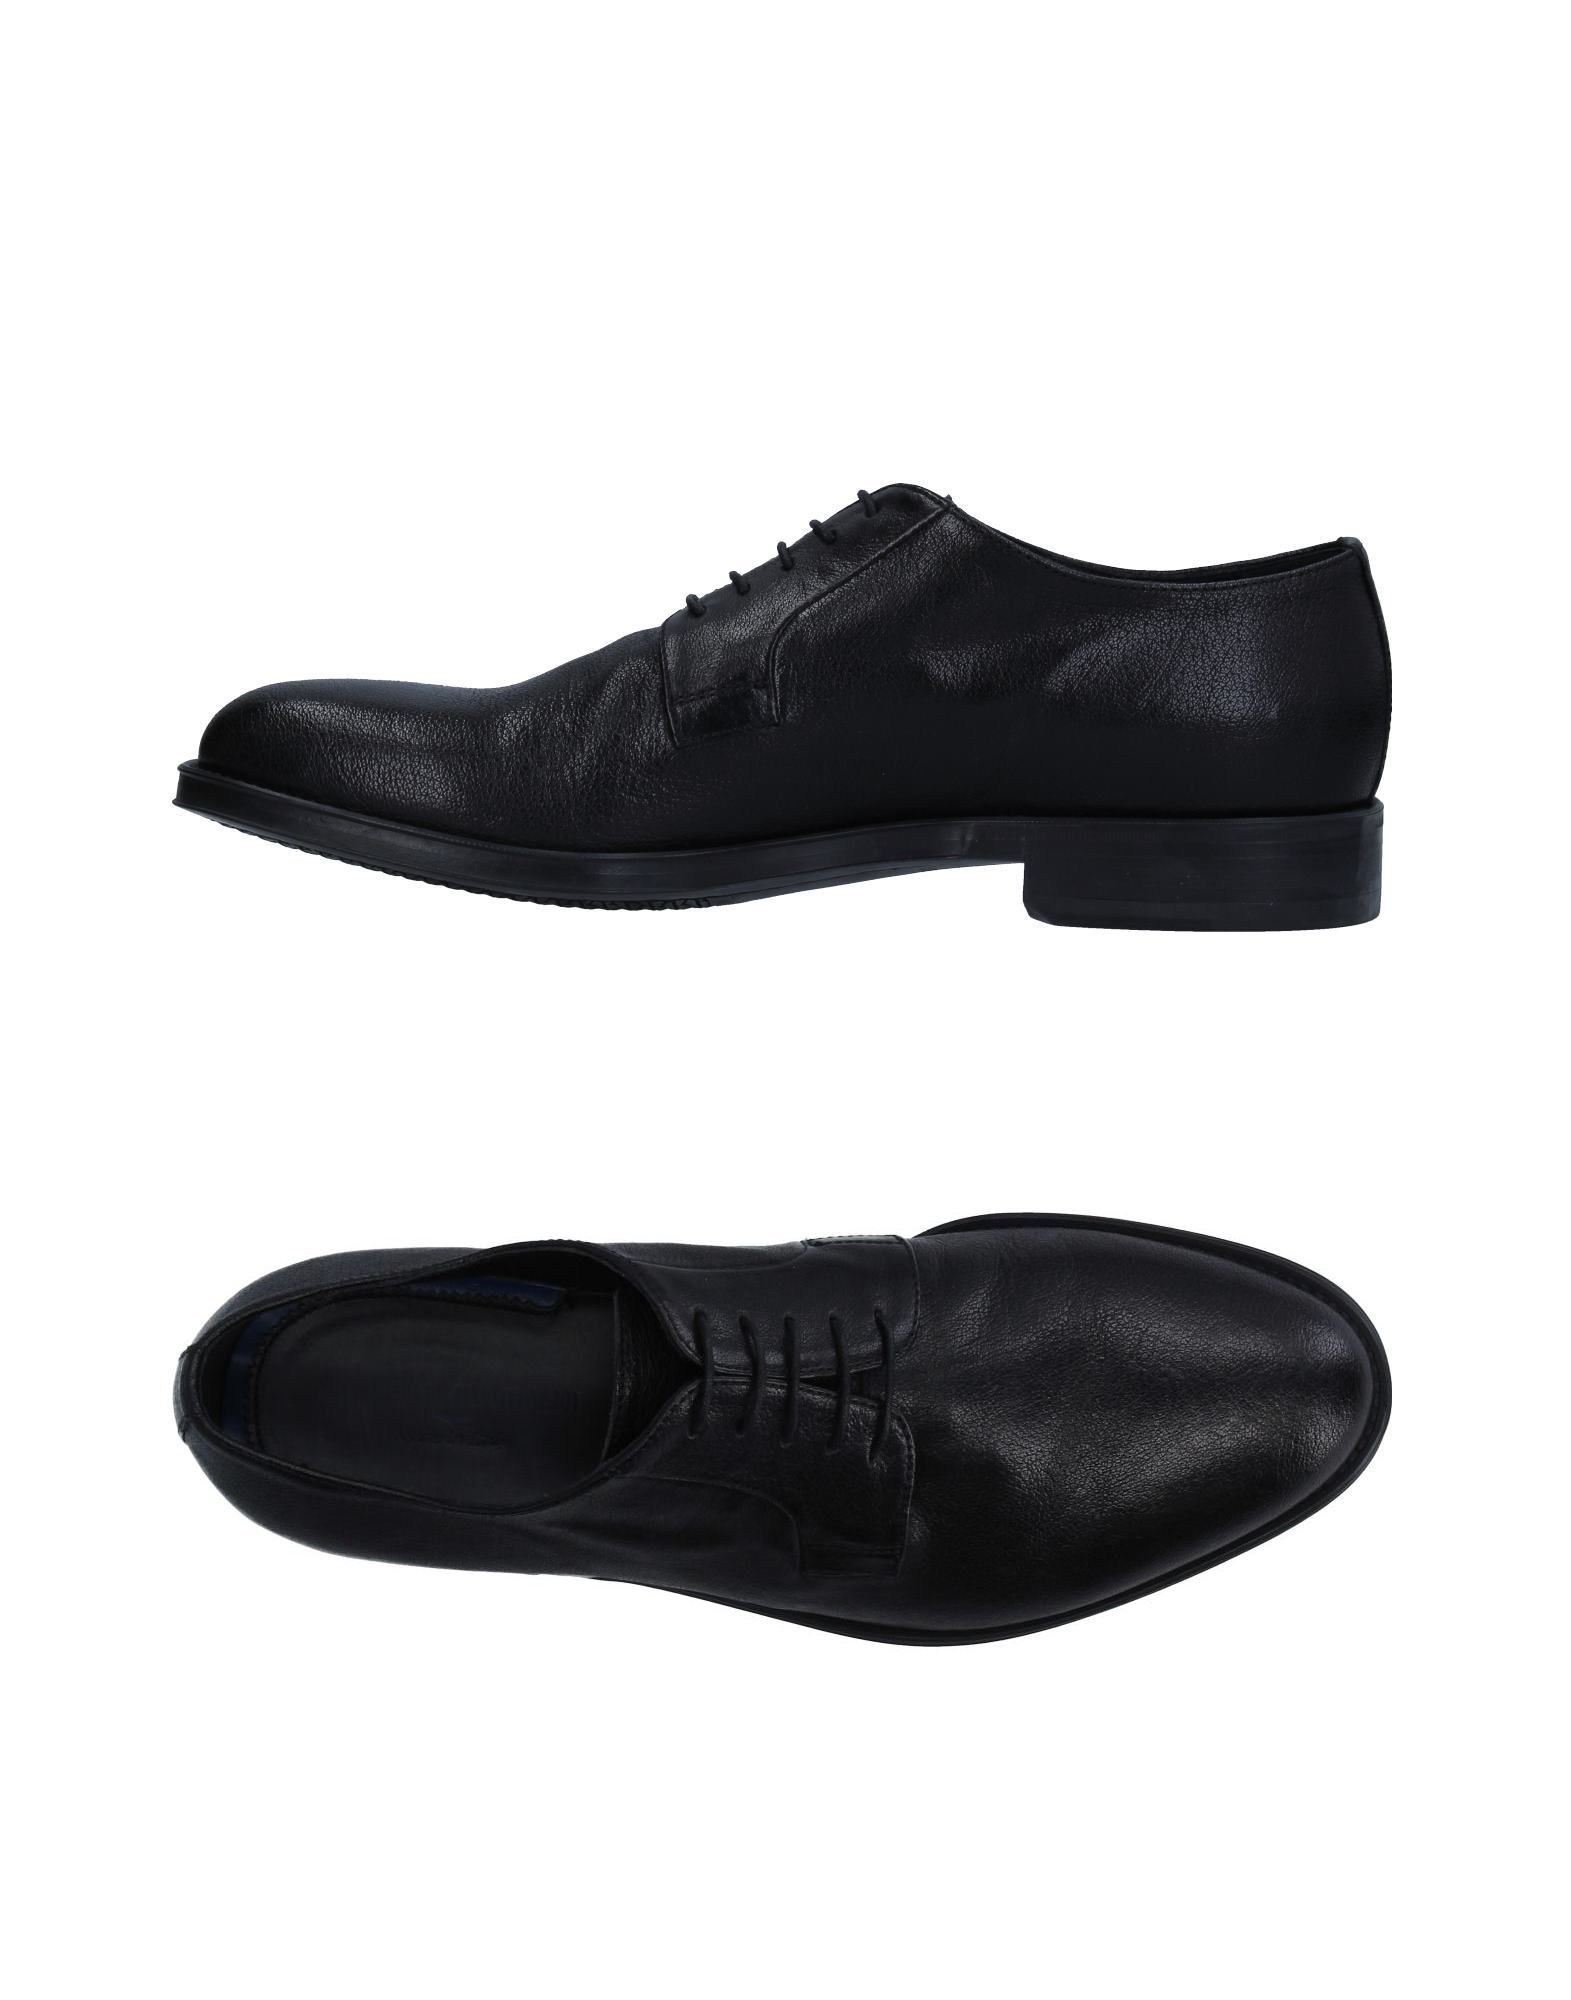 Chaussures À Lacets Alberto Guardiani Homme - Chaussures À Lacets Alberto Guardiani sur